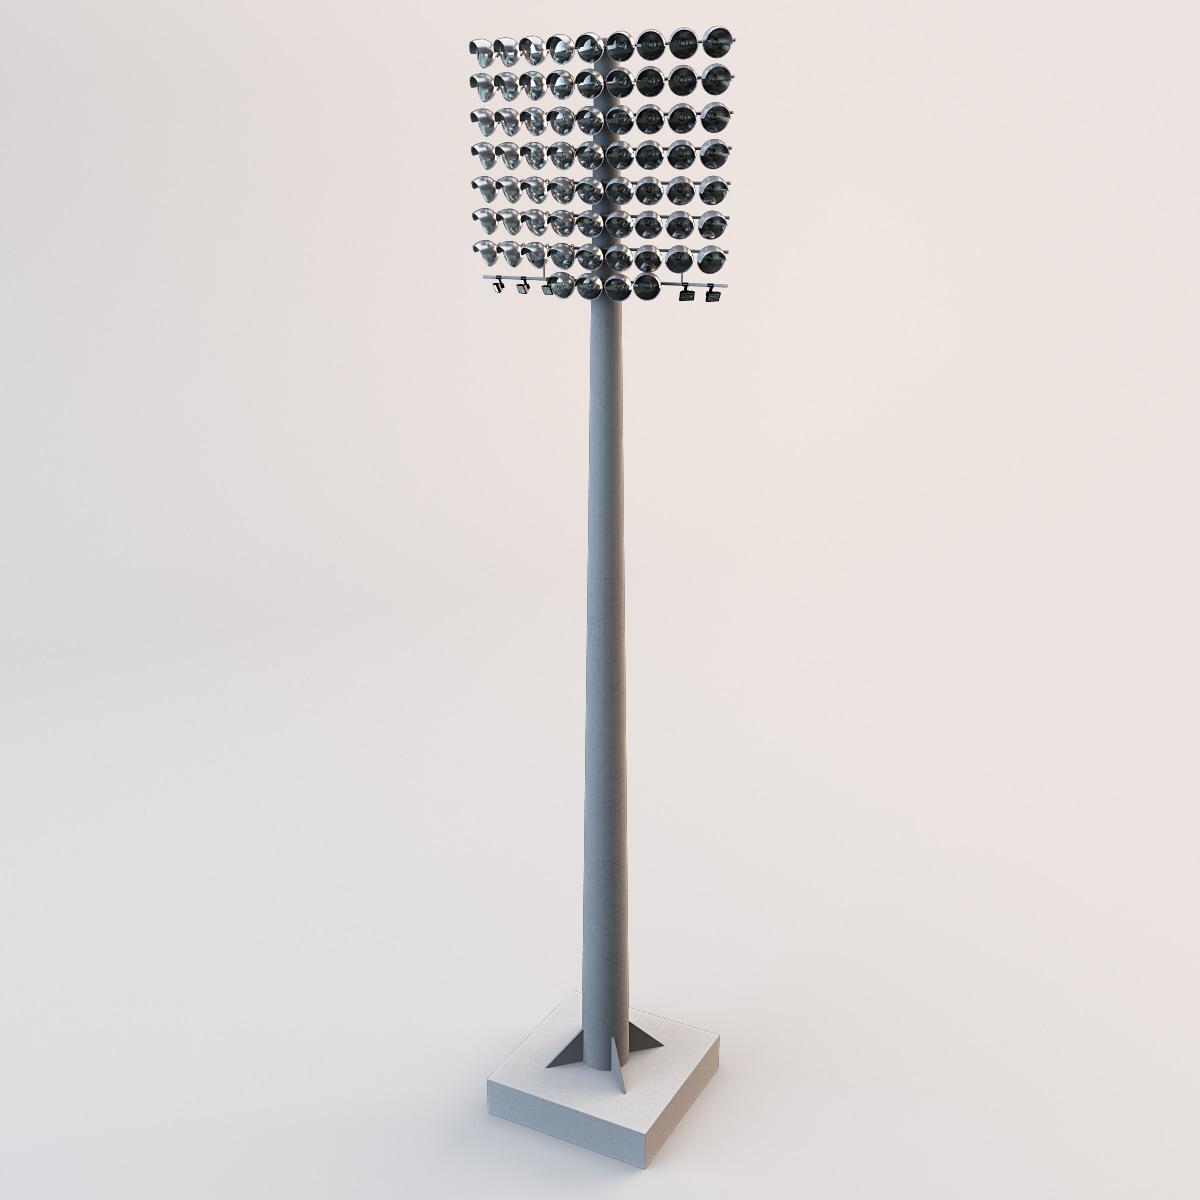 3ds max stadium lights